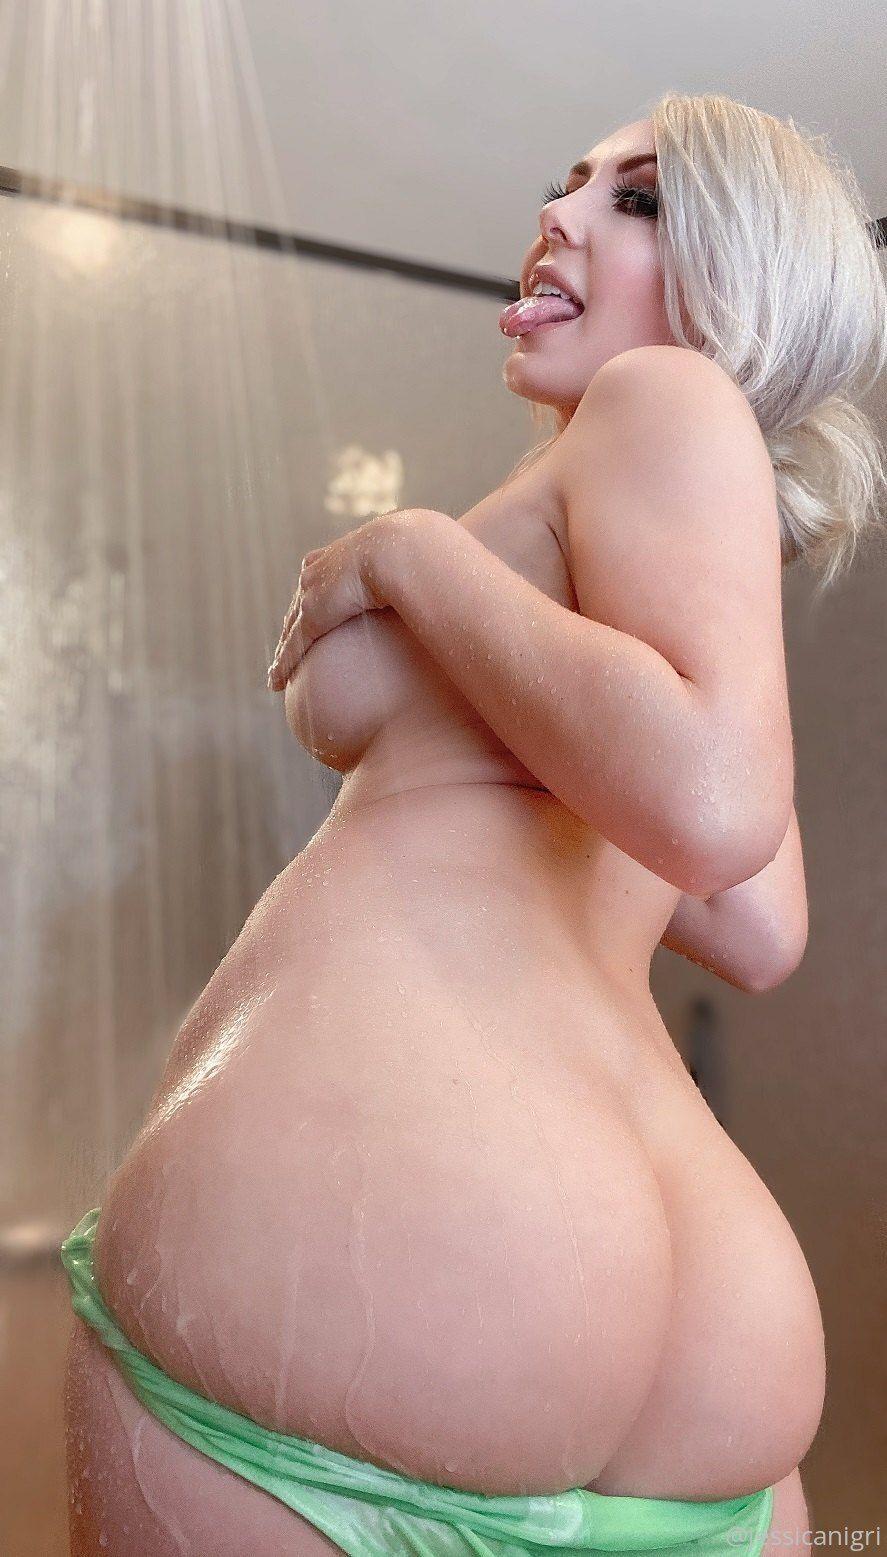 Jessica Nigri Onlyfans Leaks photo 5